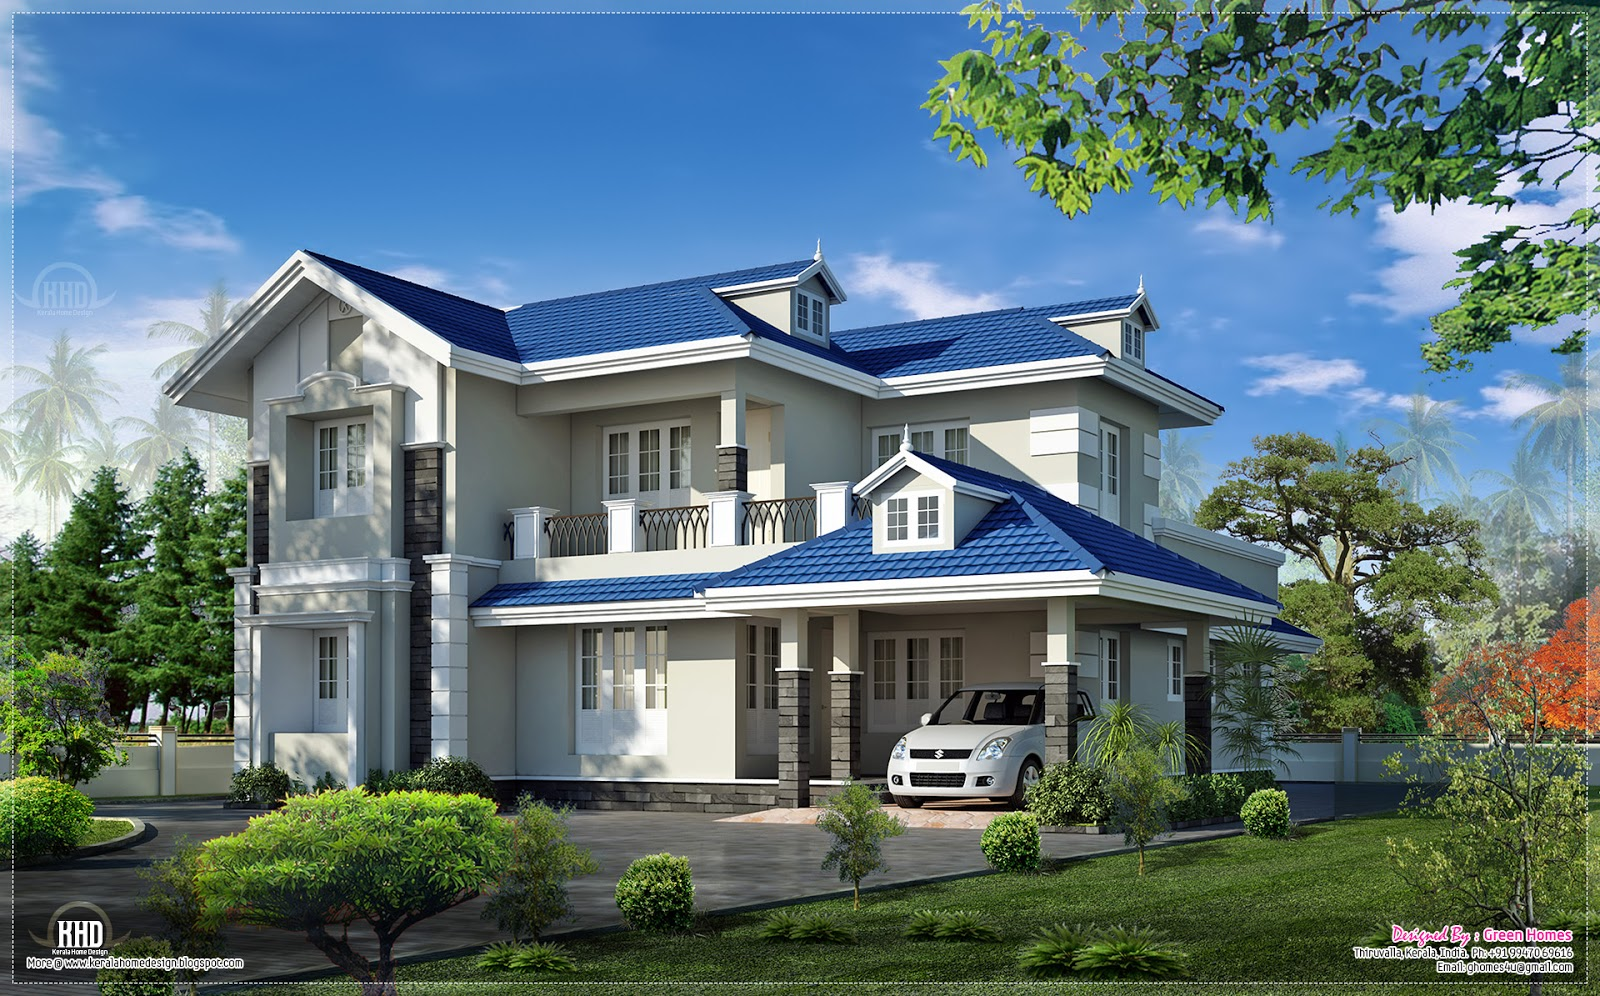 simple exterior house designs in kerala - Simple Exterior House Designs In Kerala